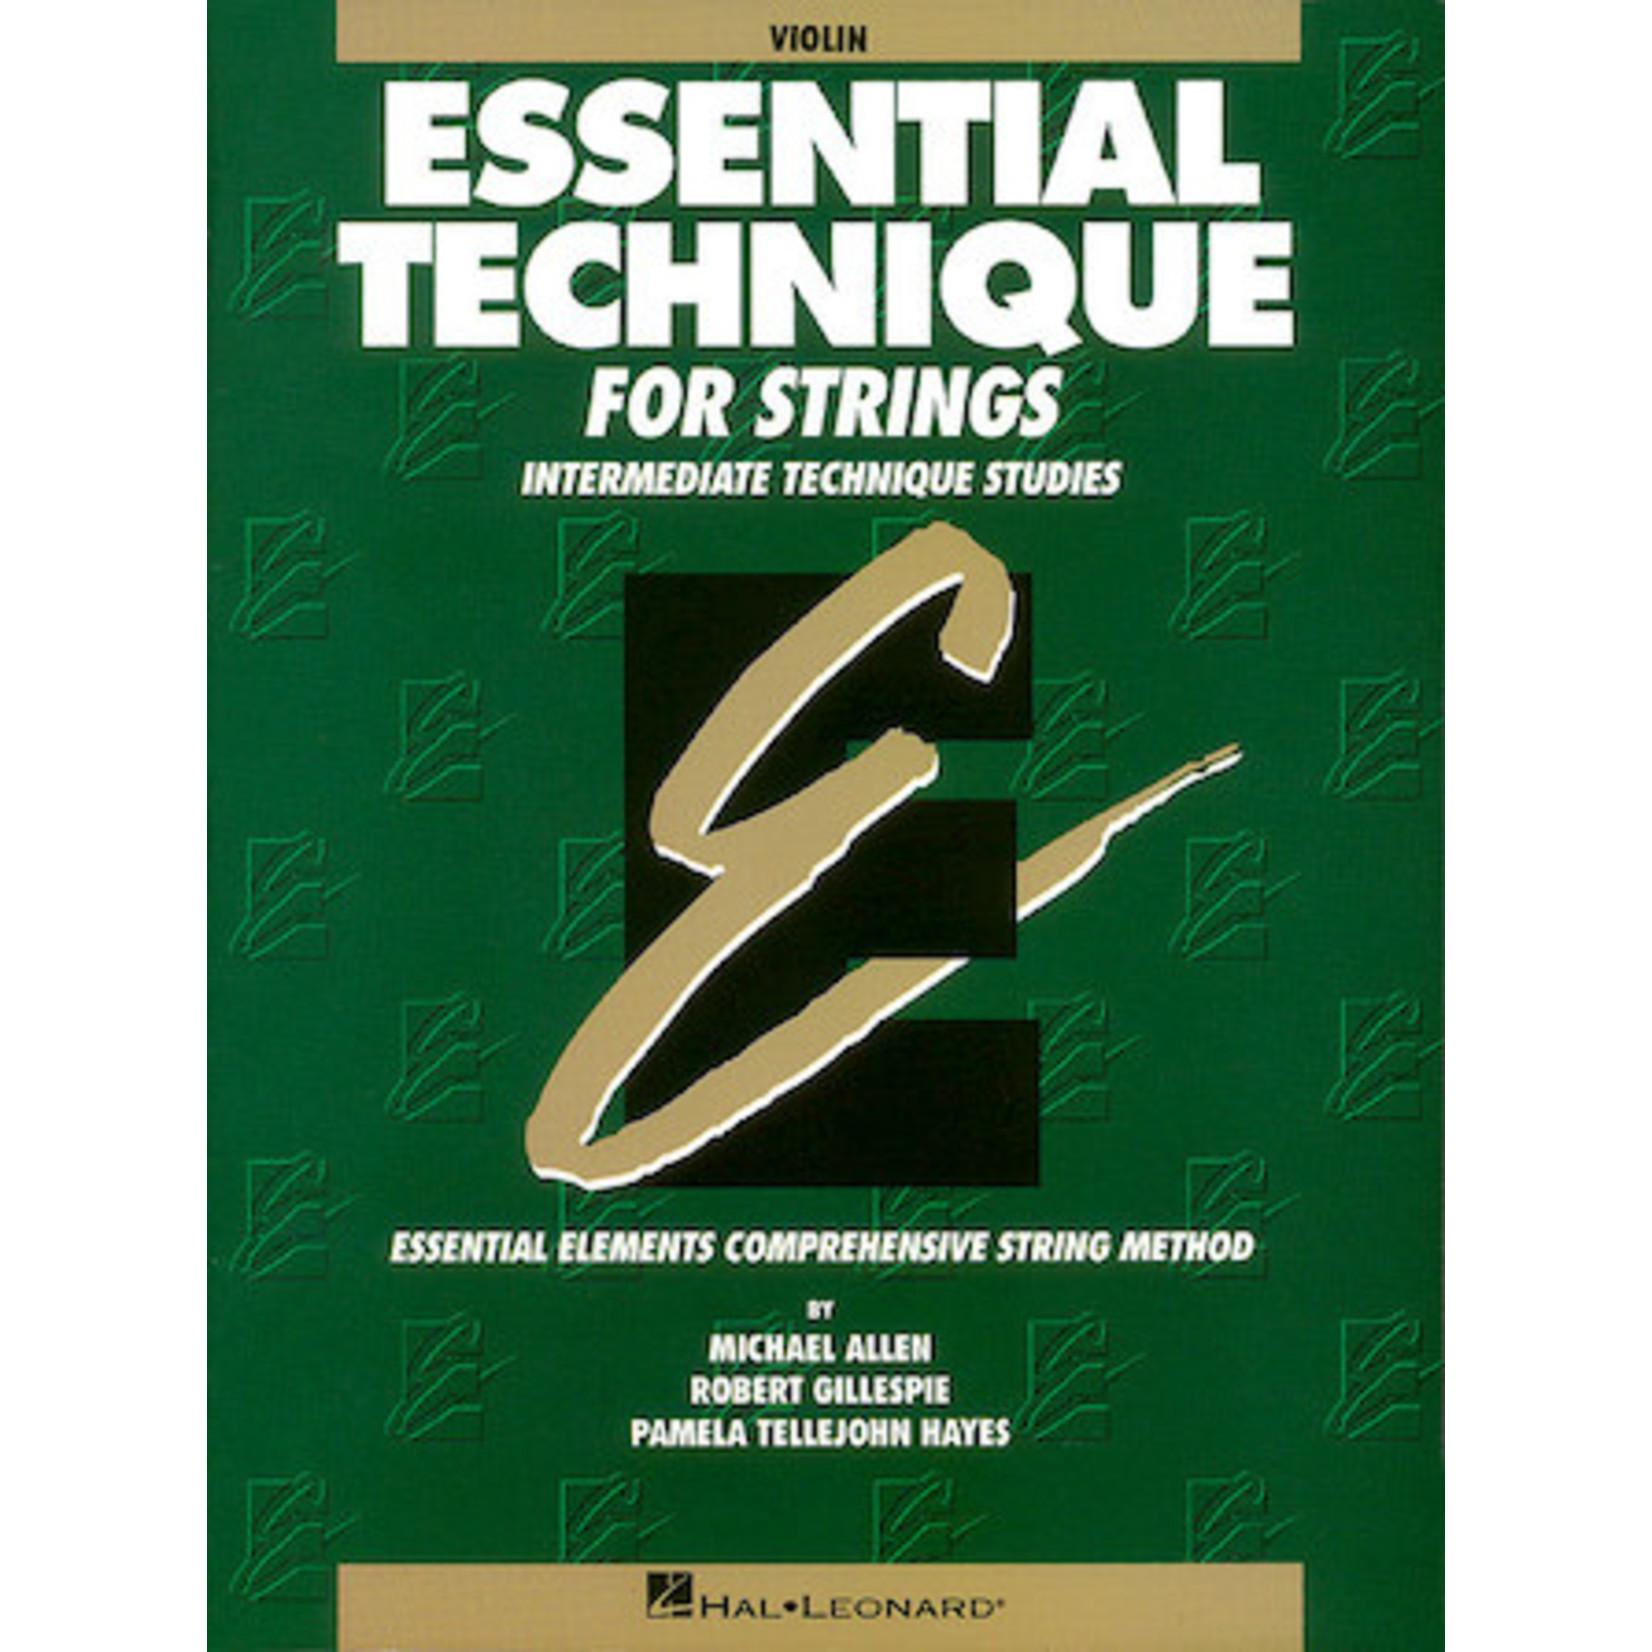 Hal Leonard Essential Technique for Strings - Violin (Original Series)